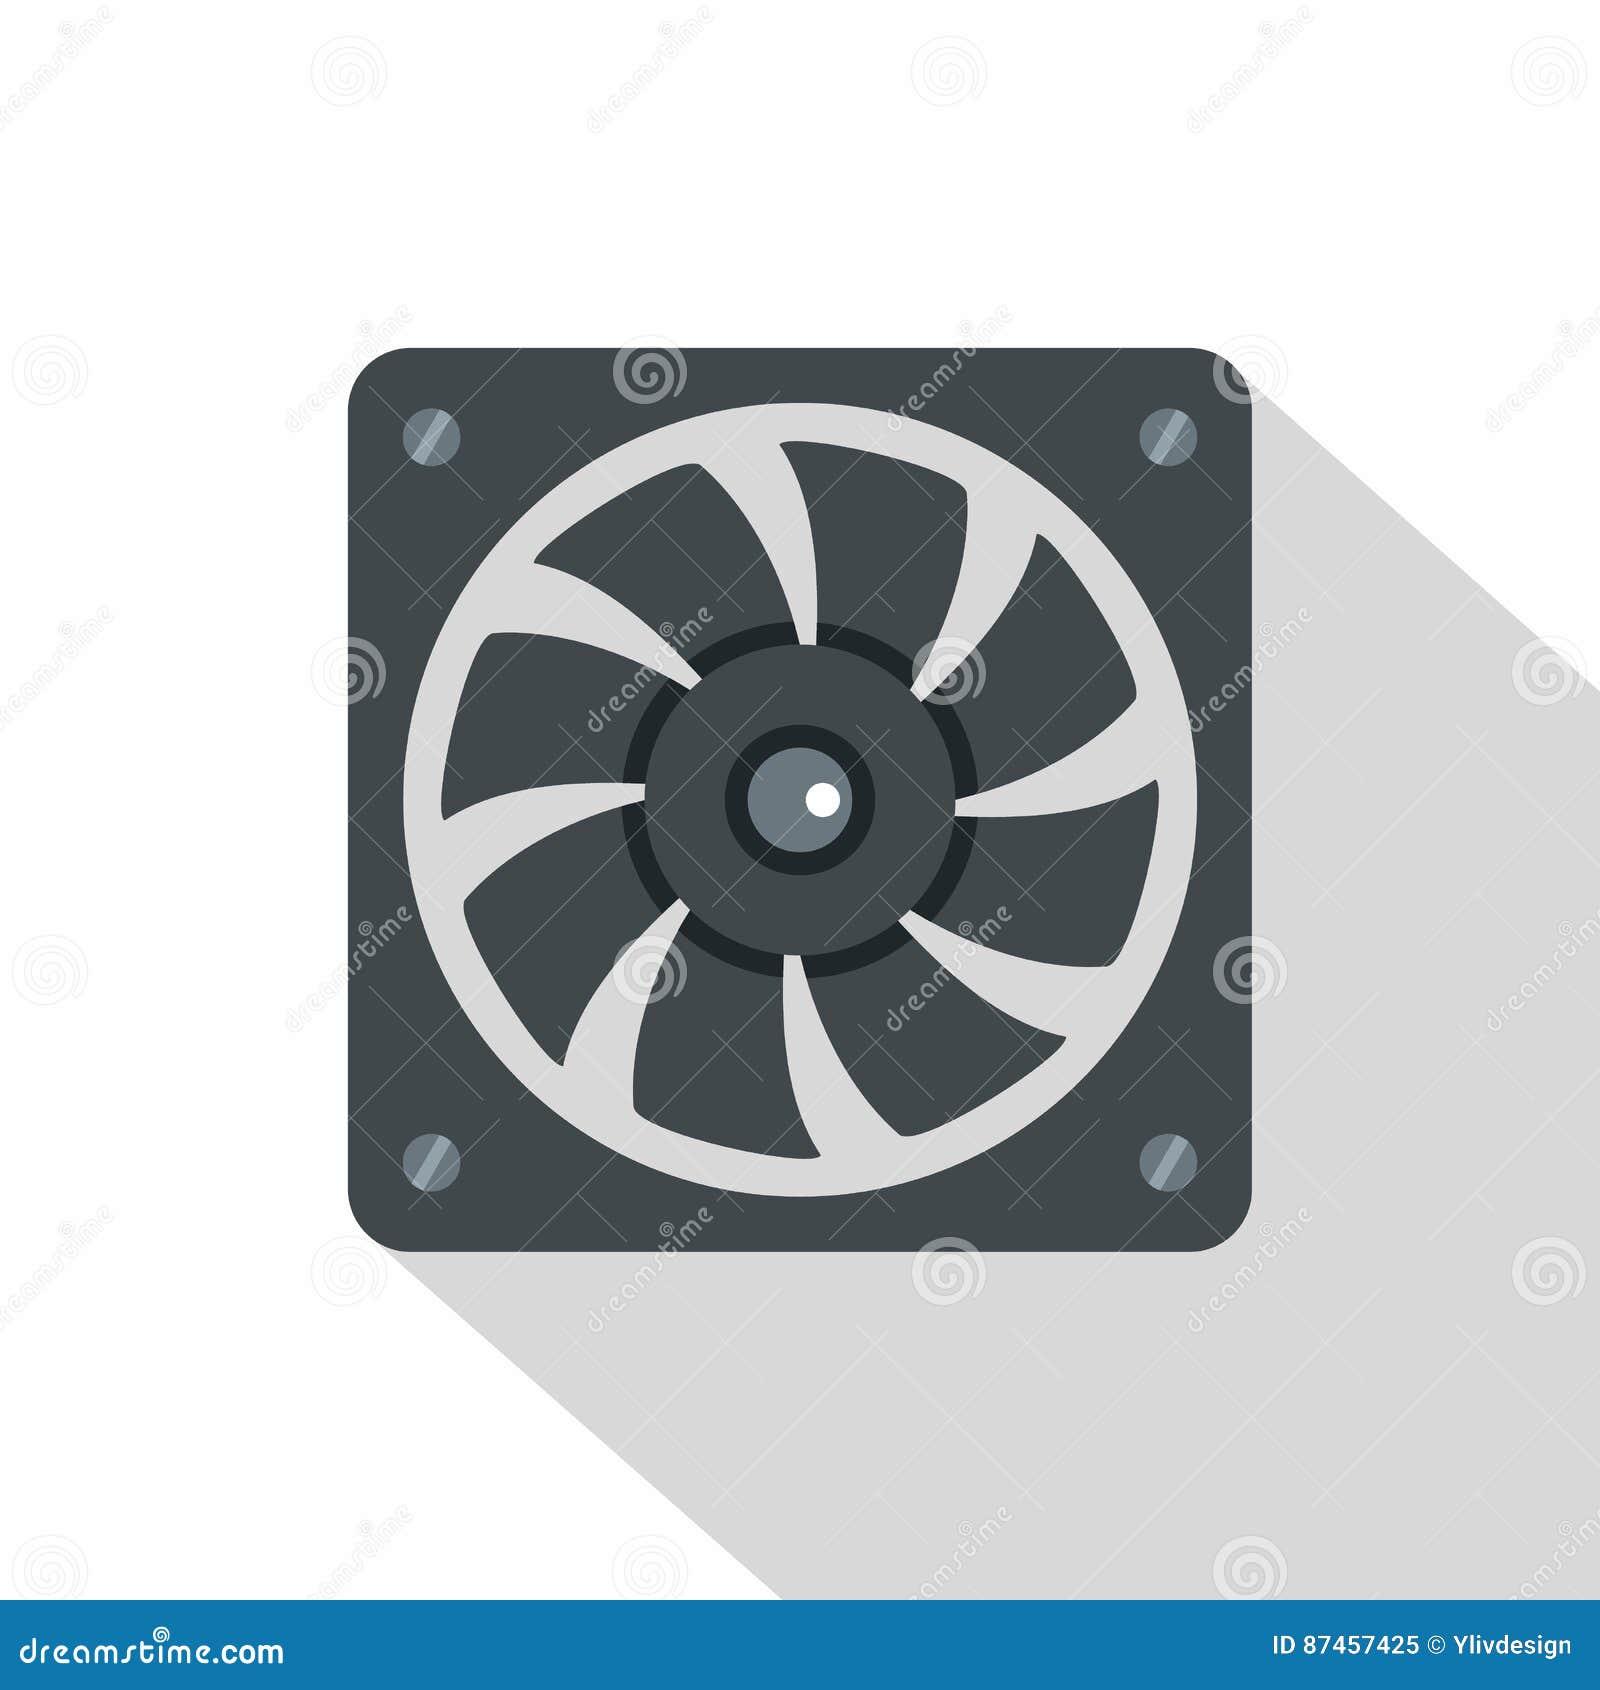 Computer power supply fan icon flat style stock vector computer power supply fan icon flat style biocorpaavc Choice Image